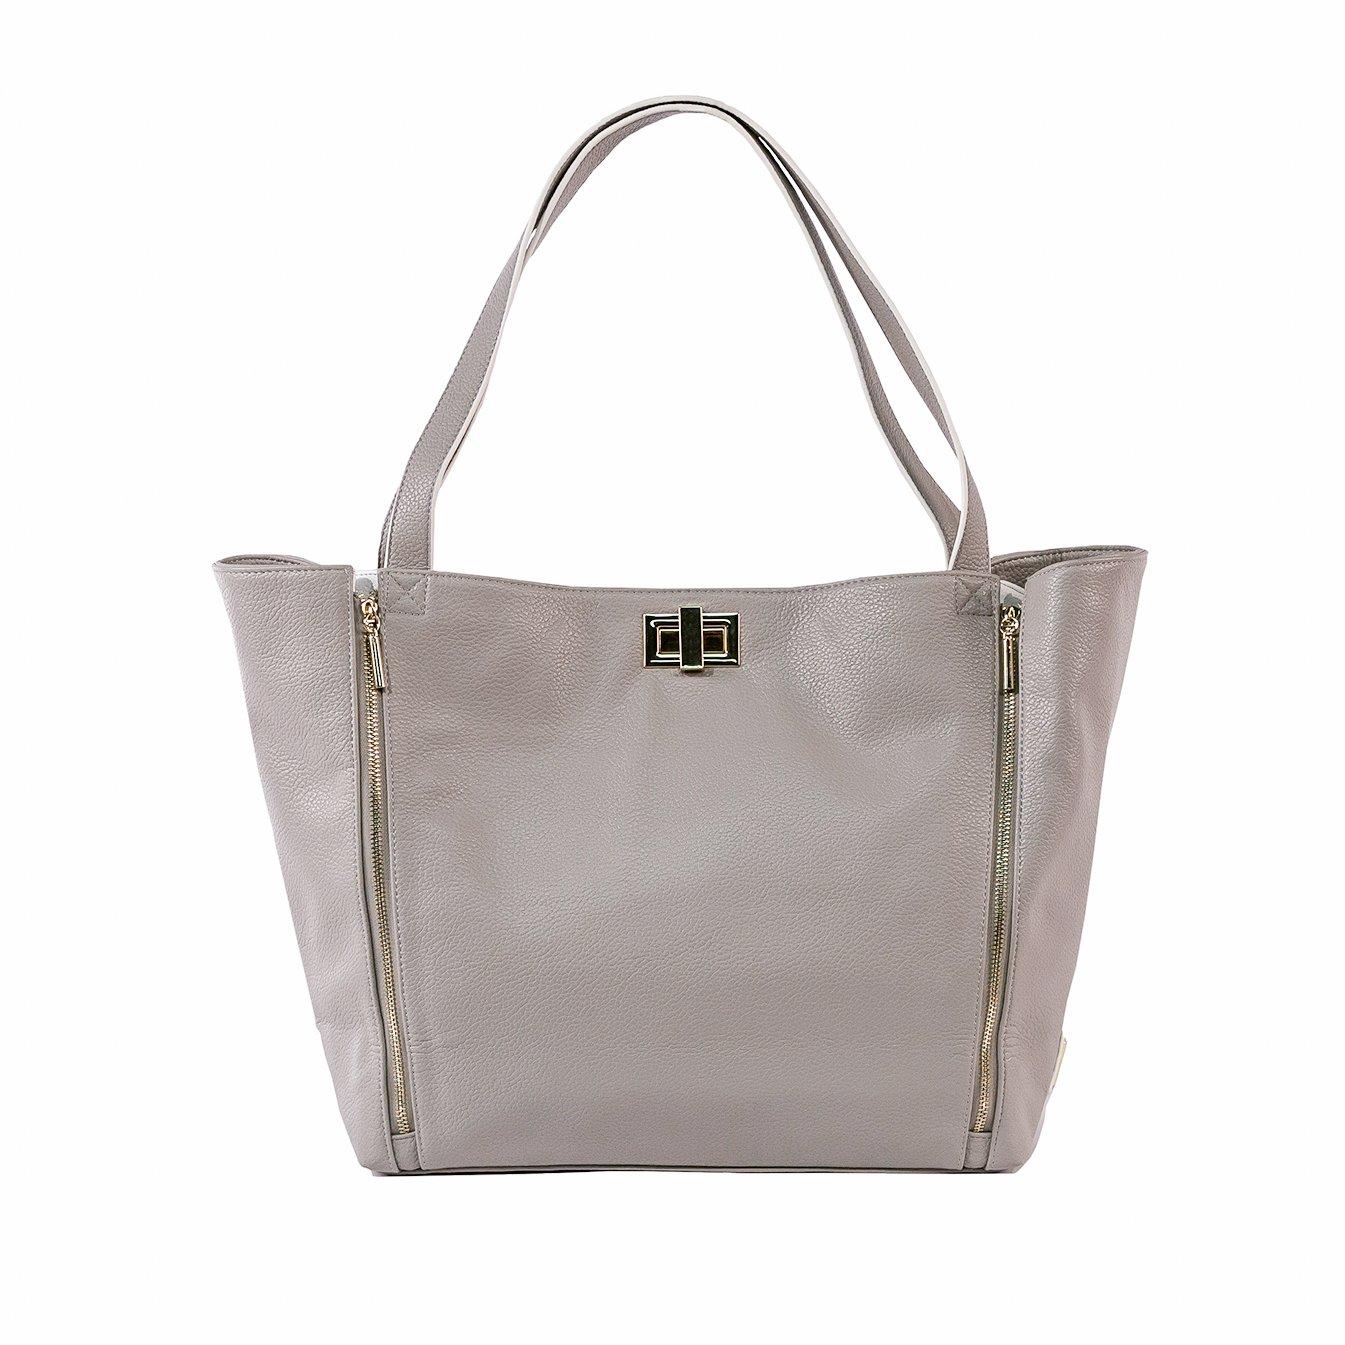 Rosie Pope Diaper Bag, Sloane Tote, Grey/White